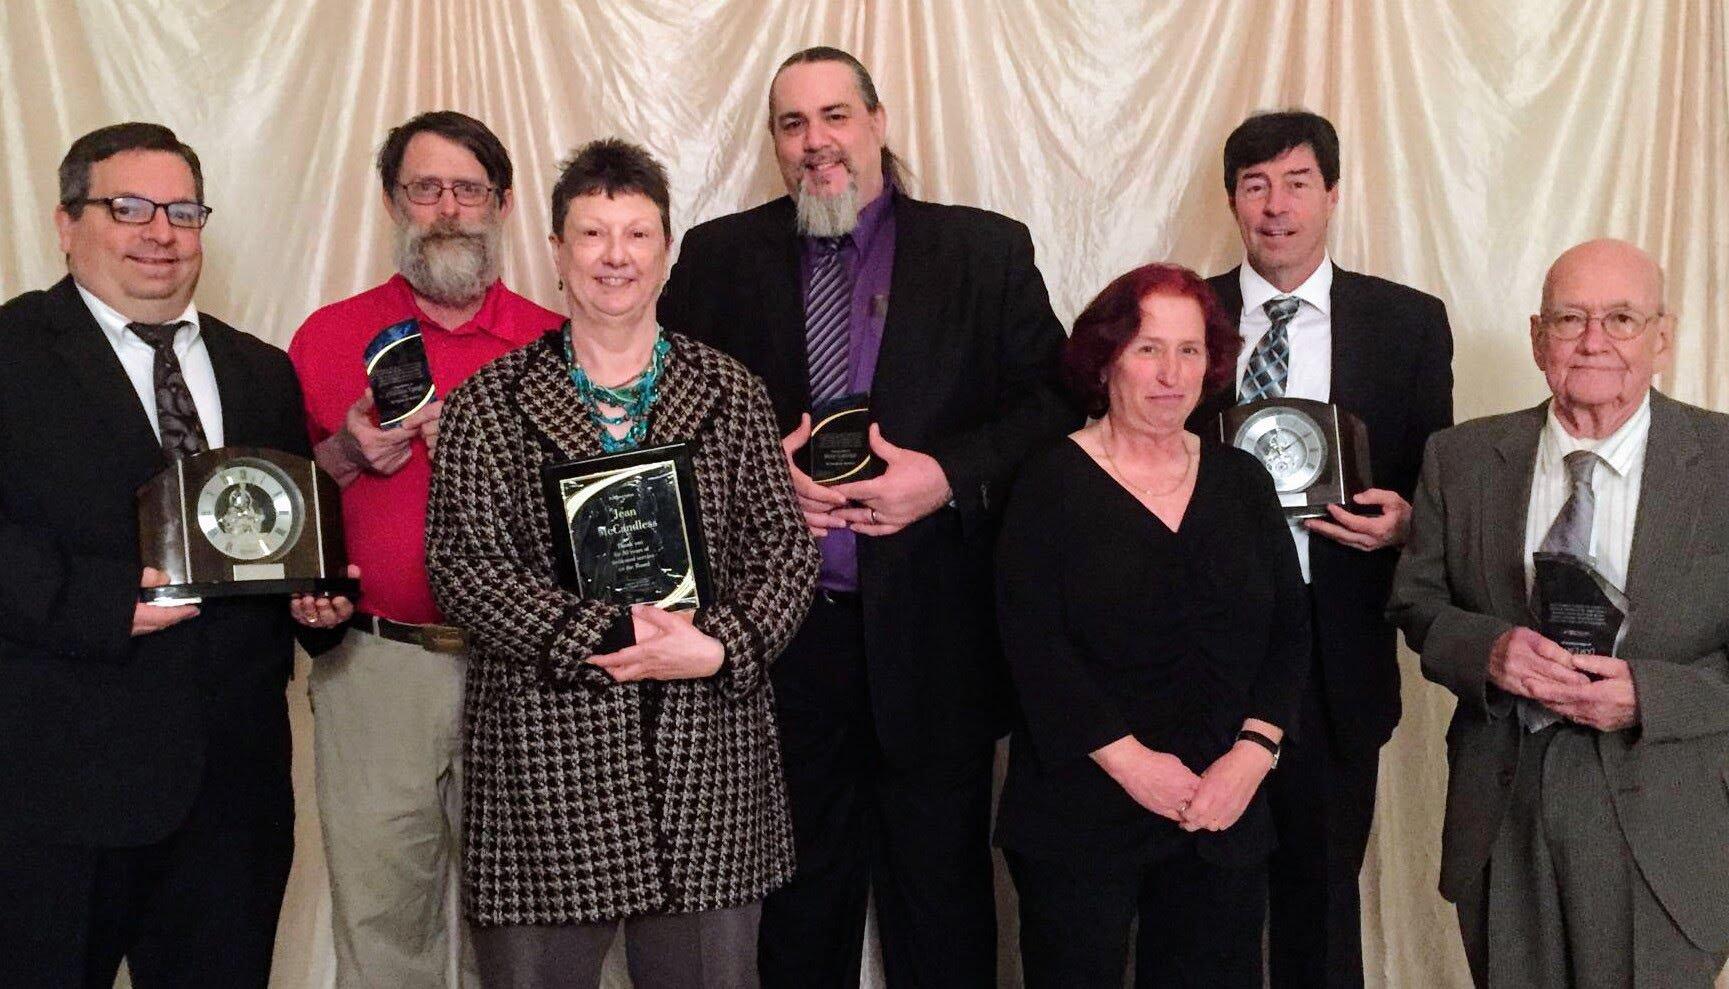 Employee Service Awards L-R:  Mark Mikel, Jonathan Tower, Jean McCandless, Mark Gardner, Susan Lynch, Tom Schibi, Don Erskin.  (Not Pictured: Jack Flynn)